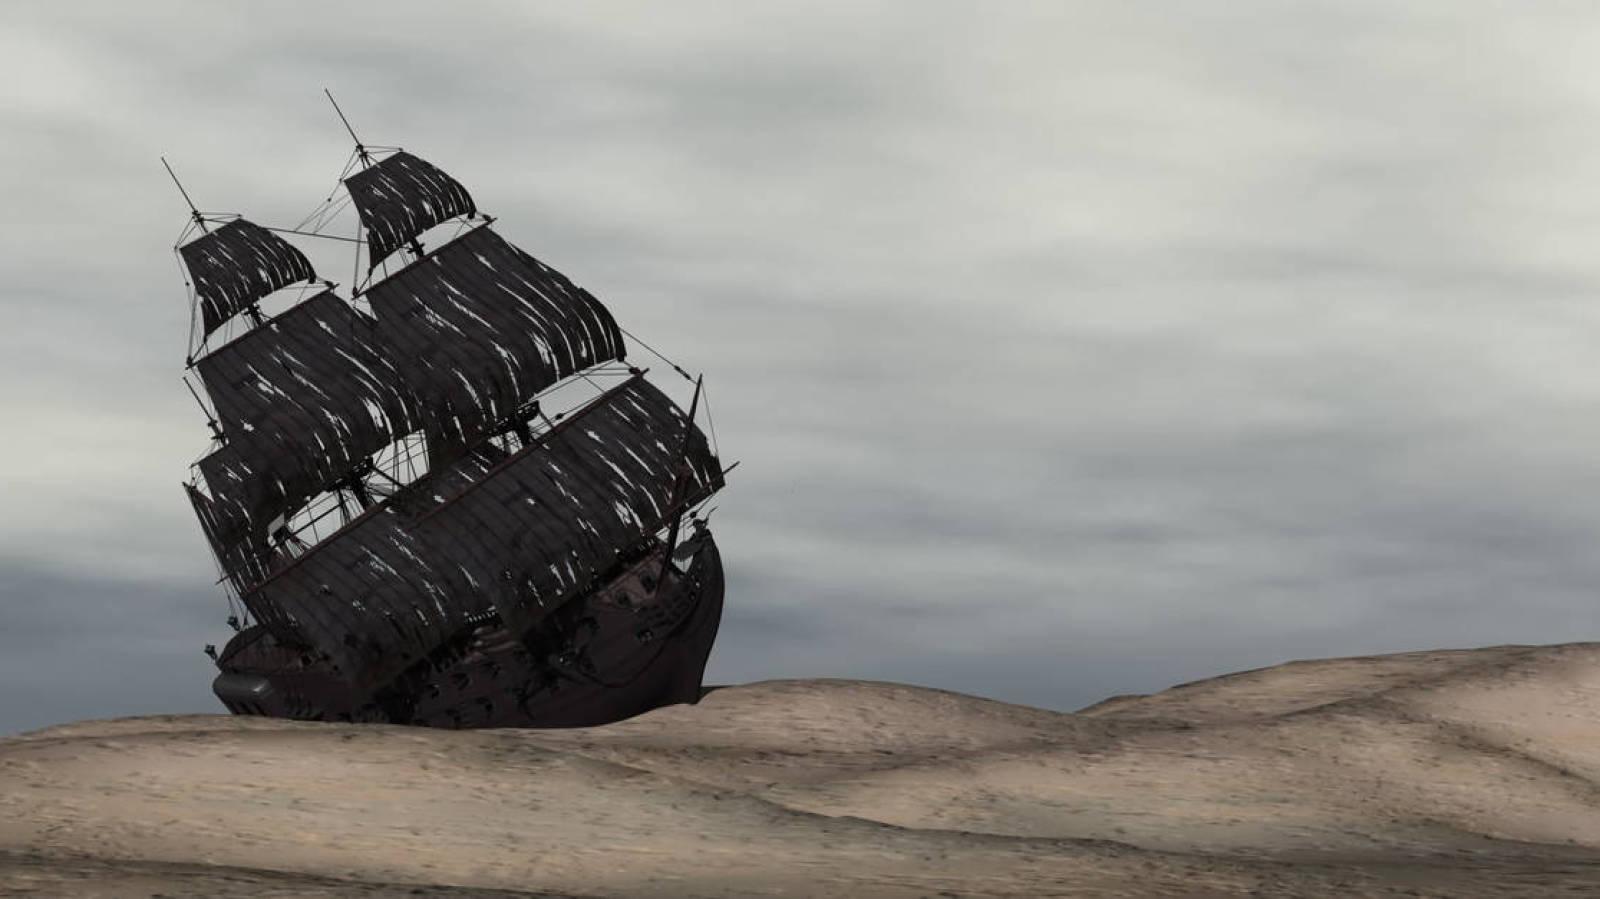 el-misterio-del-tesoro-vikingo-perdido-en-el-desierto.jpg